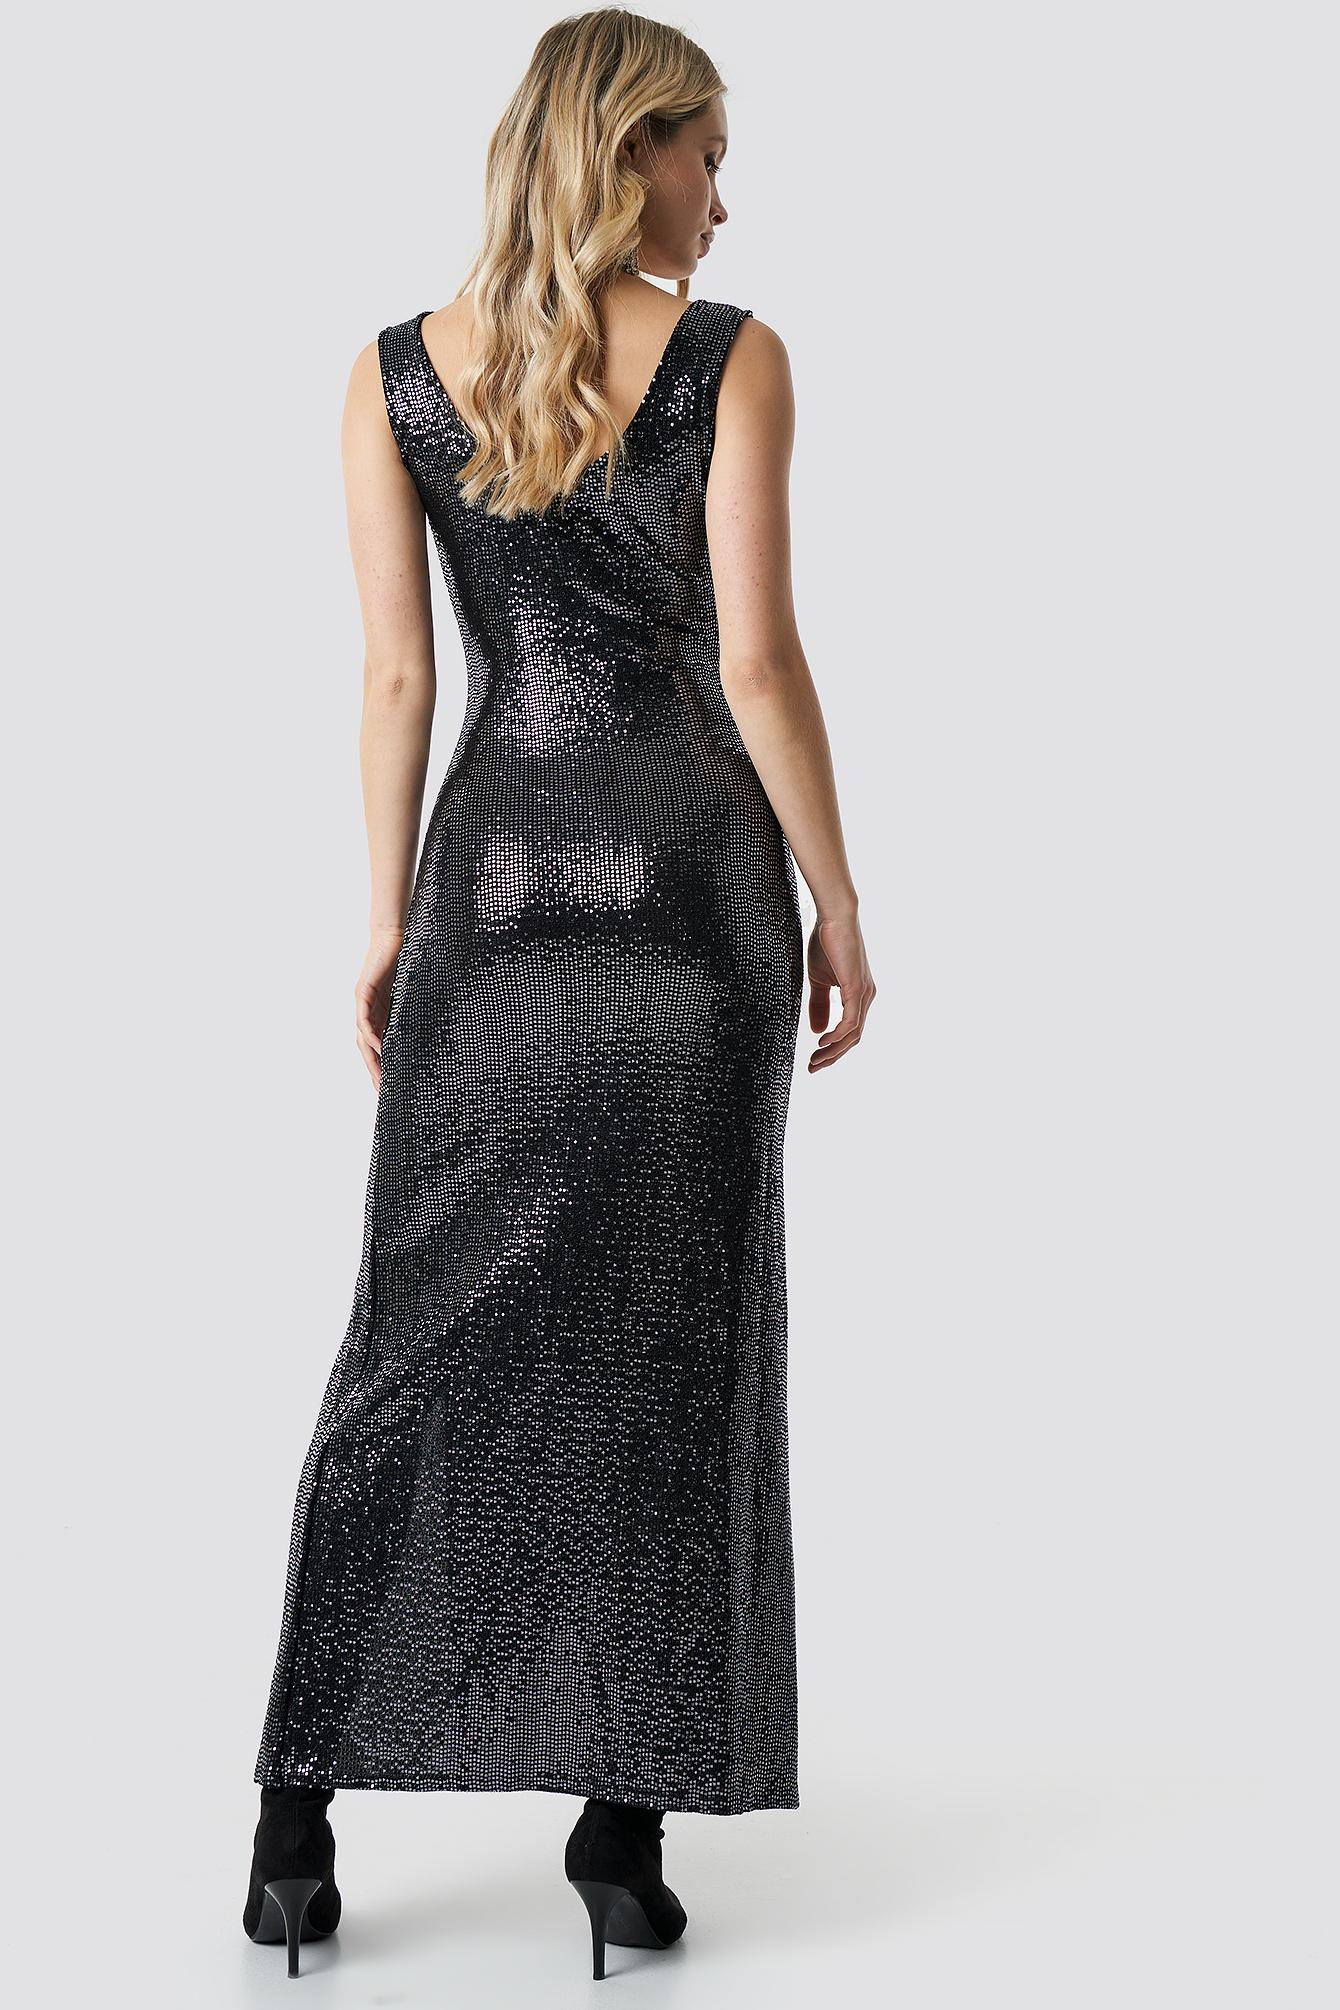 Ernt 4 Dress NA-KD.COM